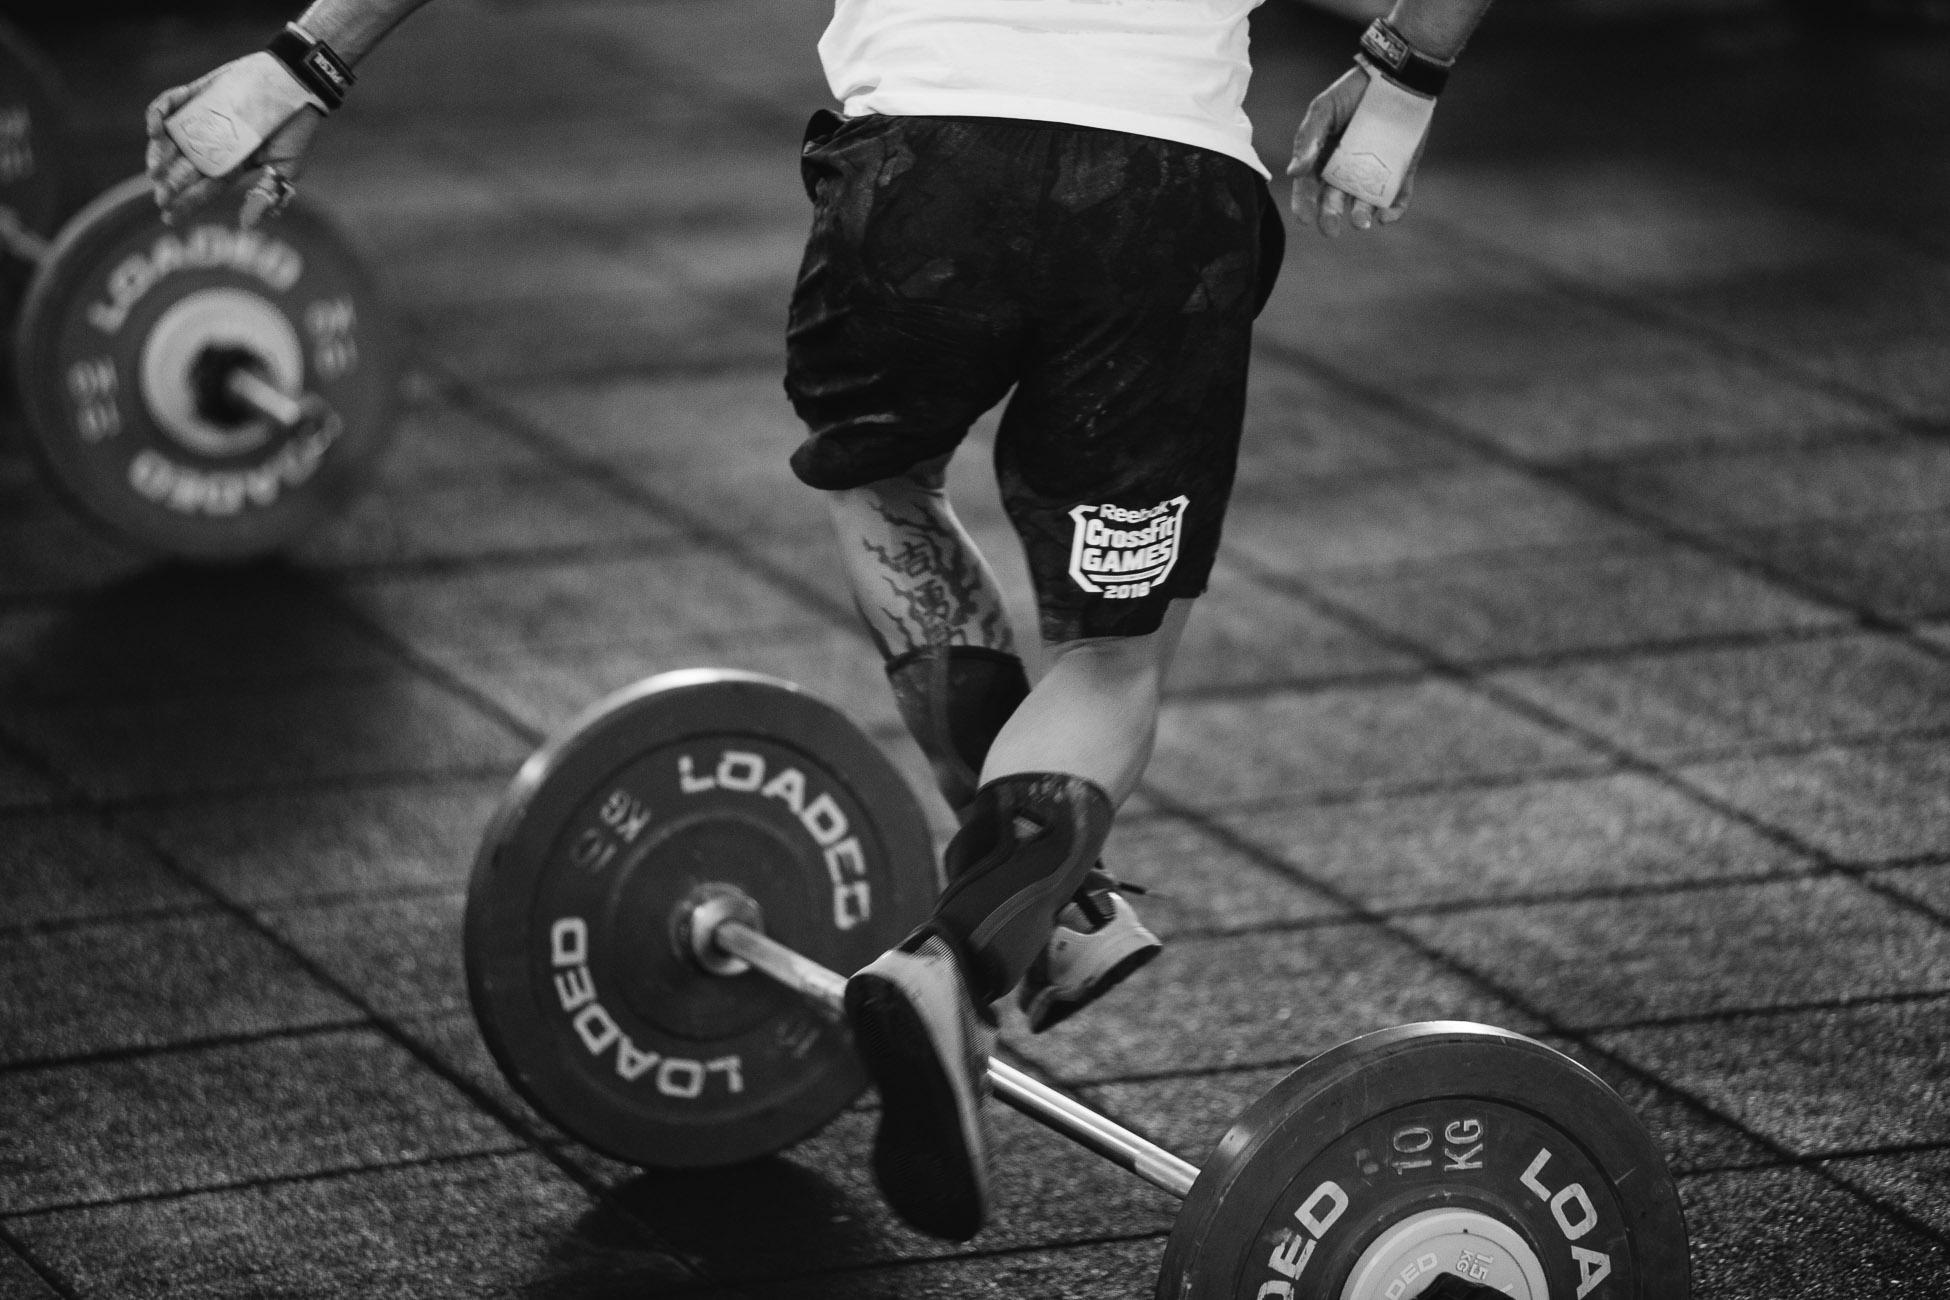 crossfit-games-open-fitness-atleta-fotografia-002.jpg